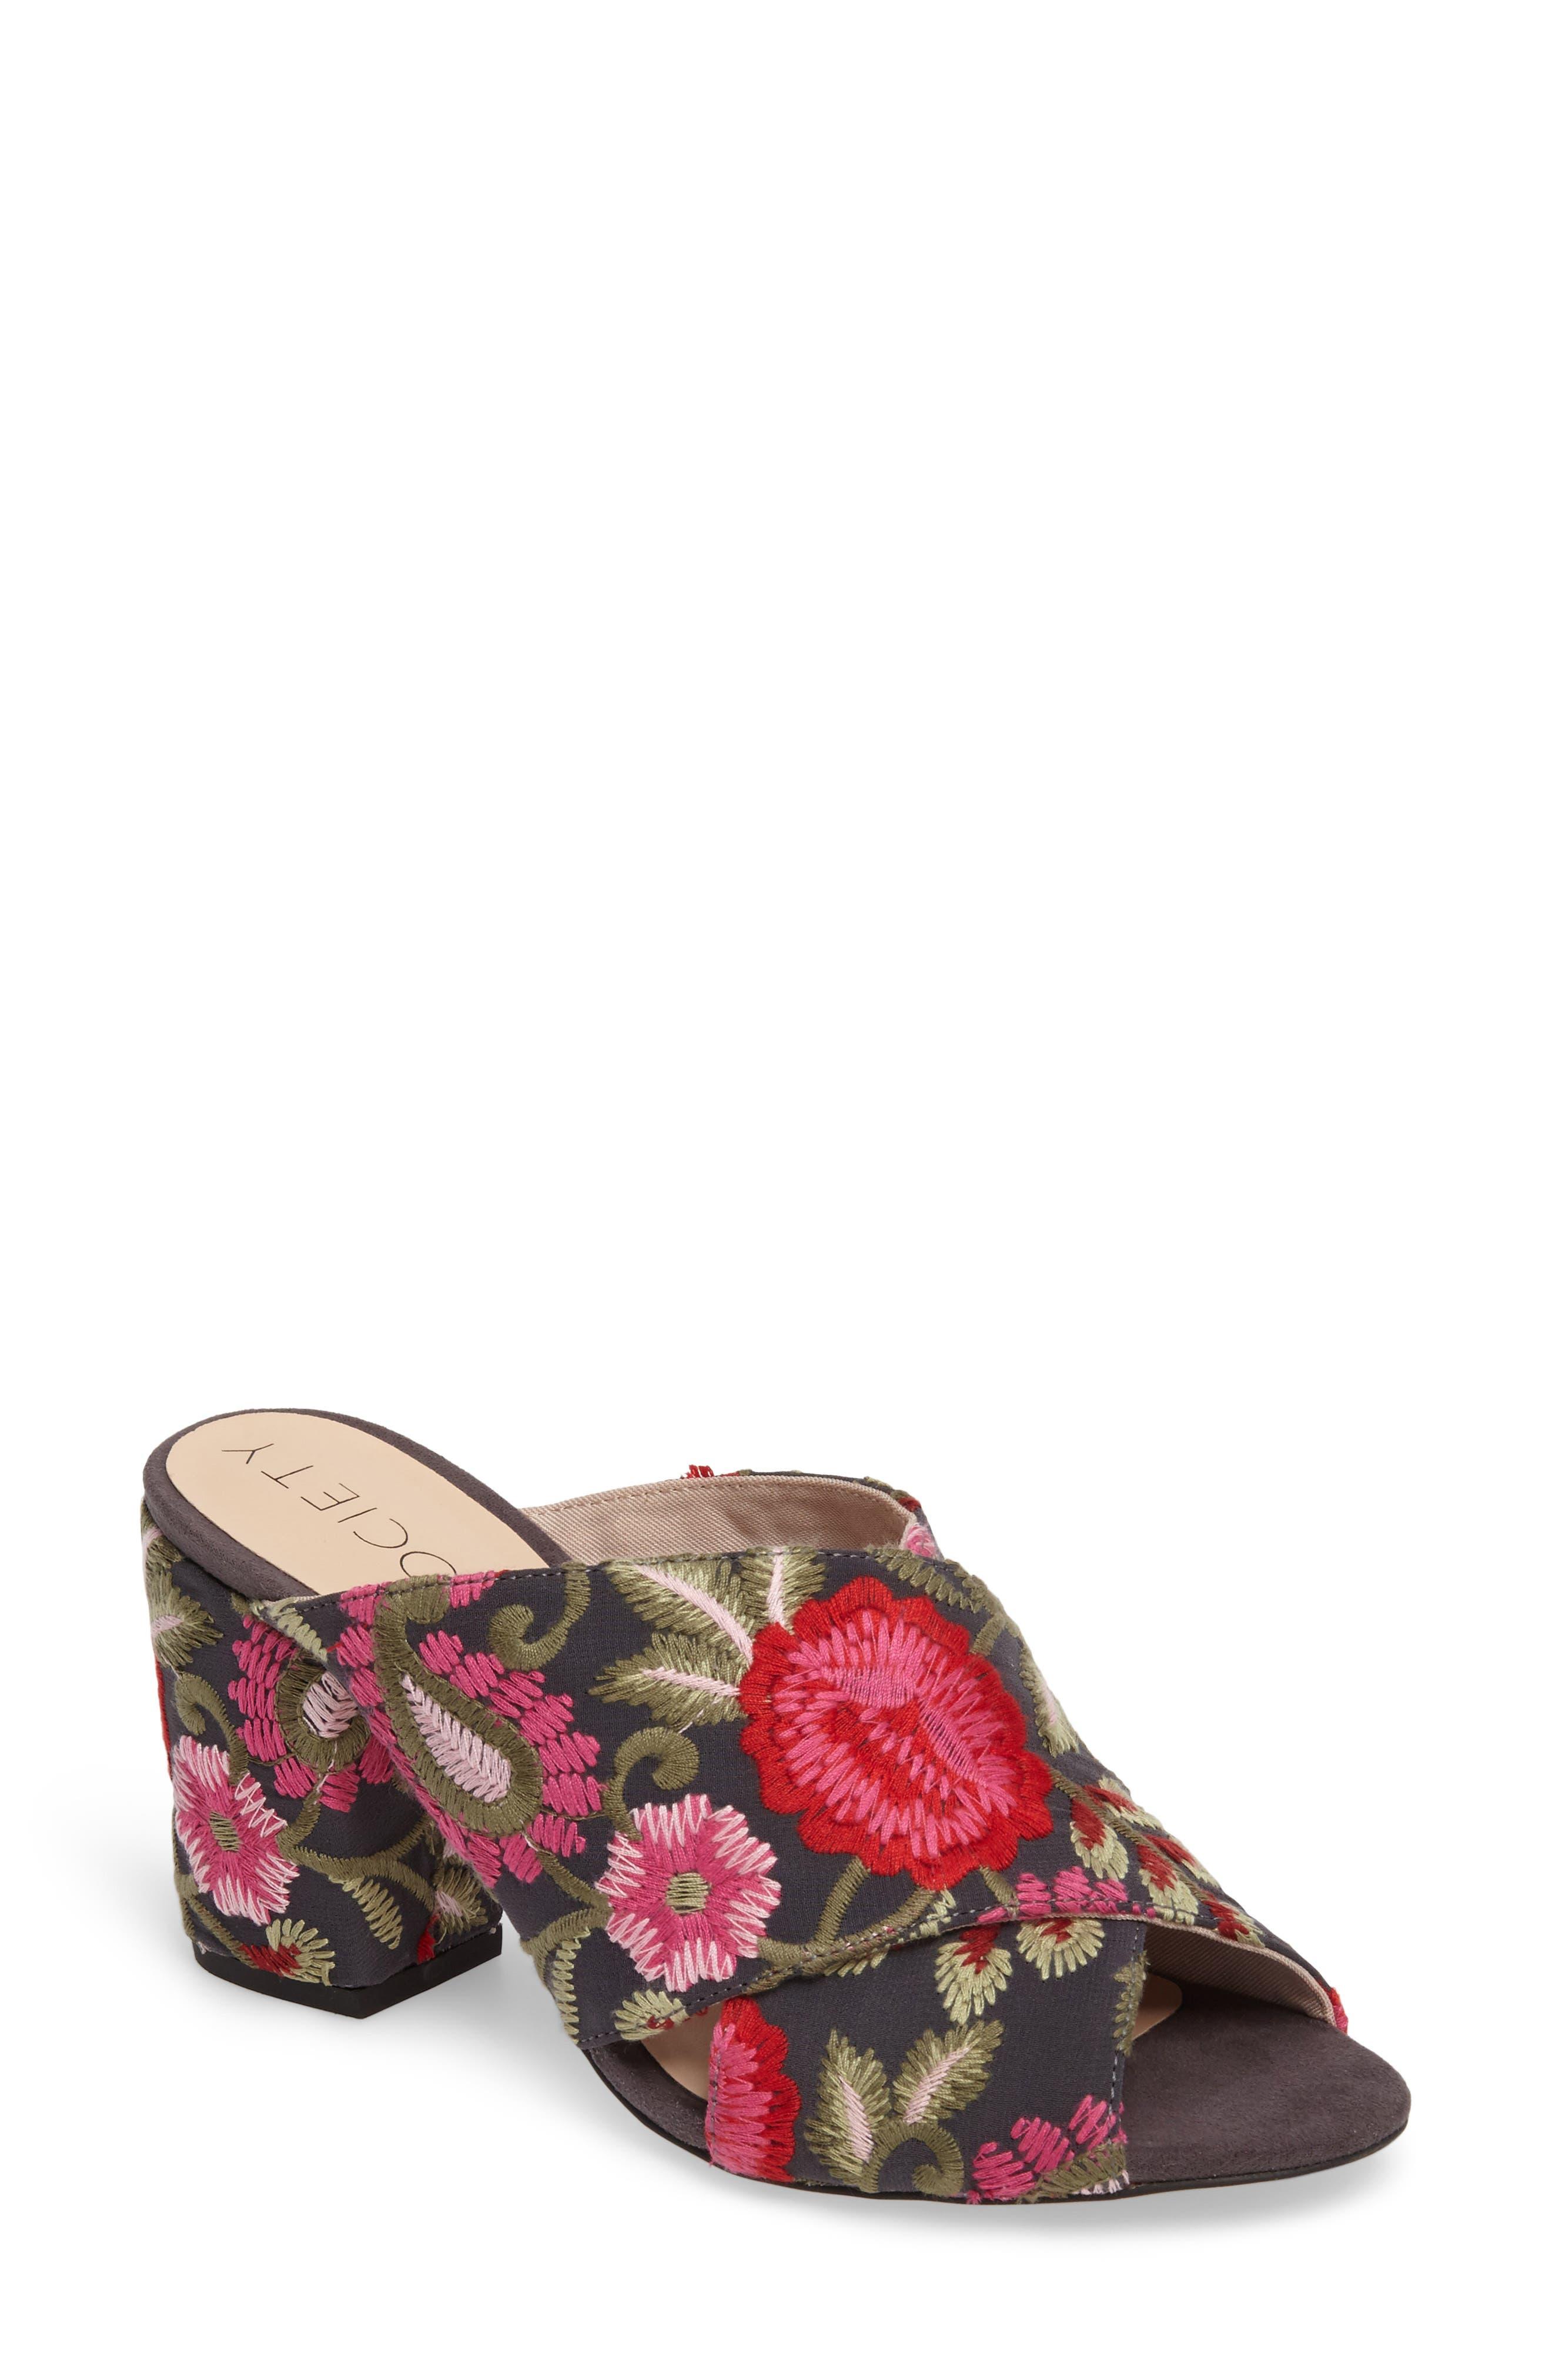 Sole Society Luella Flower Embroidered Slide (Women)